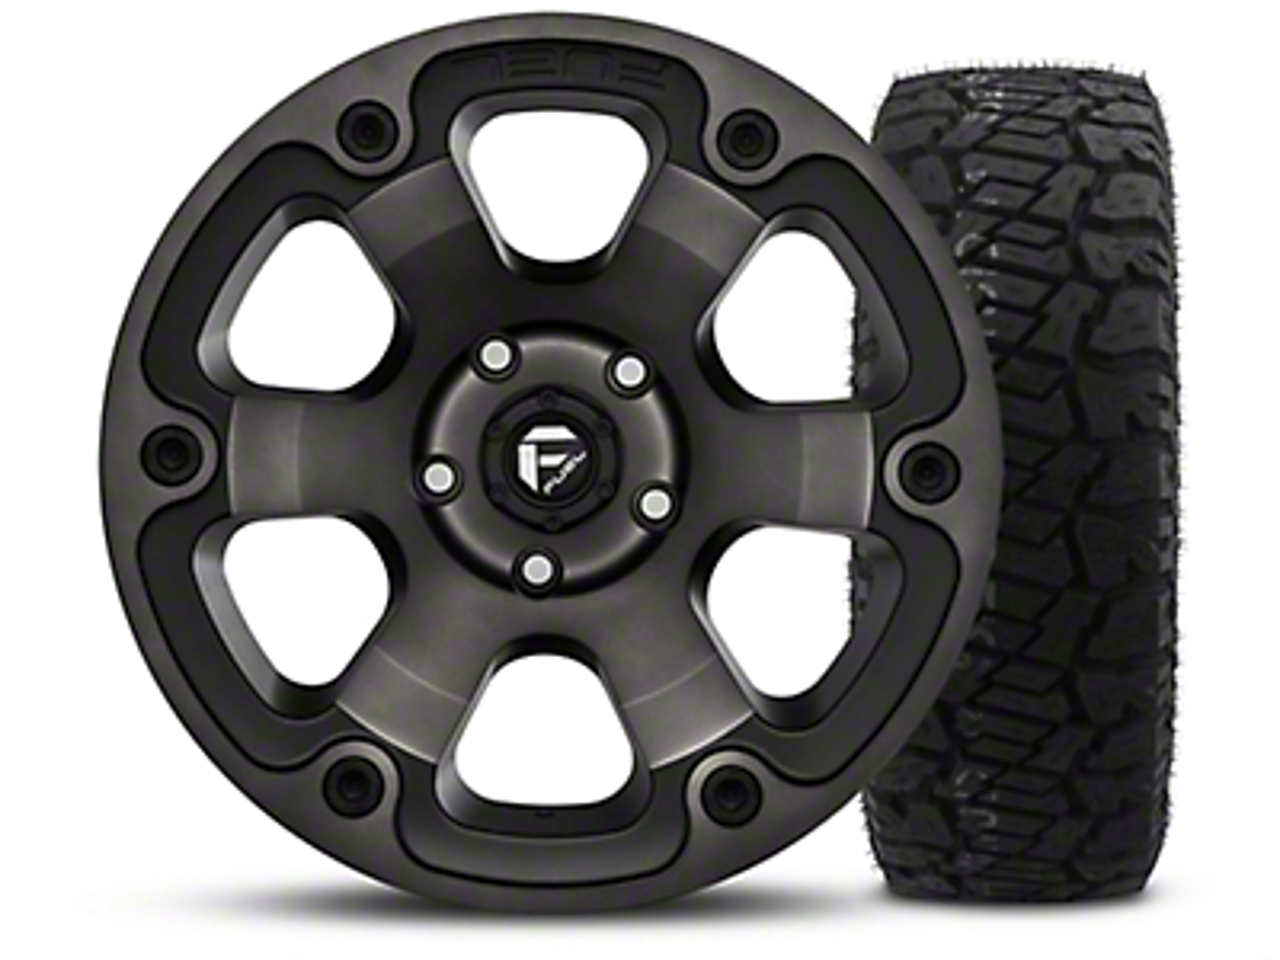 Fuel Wheels Beast Black Machined - 17x9 Wheel - and Dick Cepek Fun Country Tire - 315/70R17 (07-18 Jeep Wrangler JK; 2018 Jeep Wrangler JL)